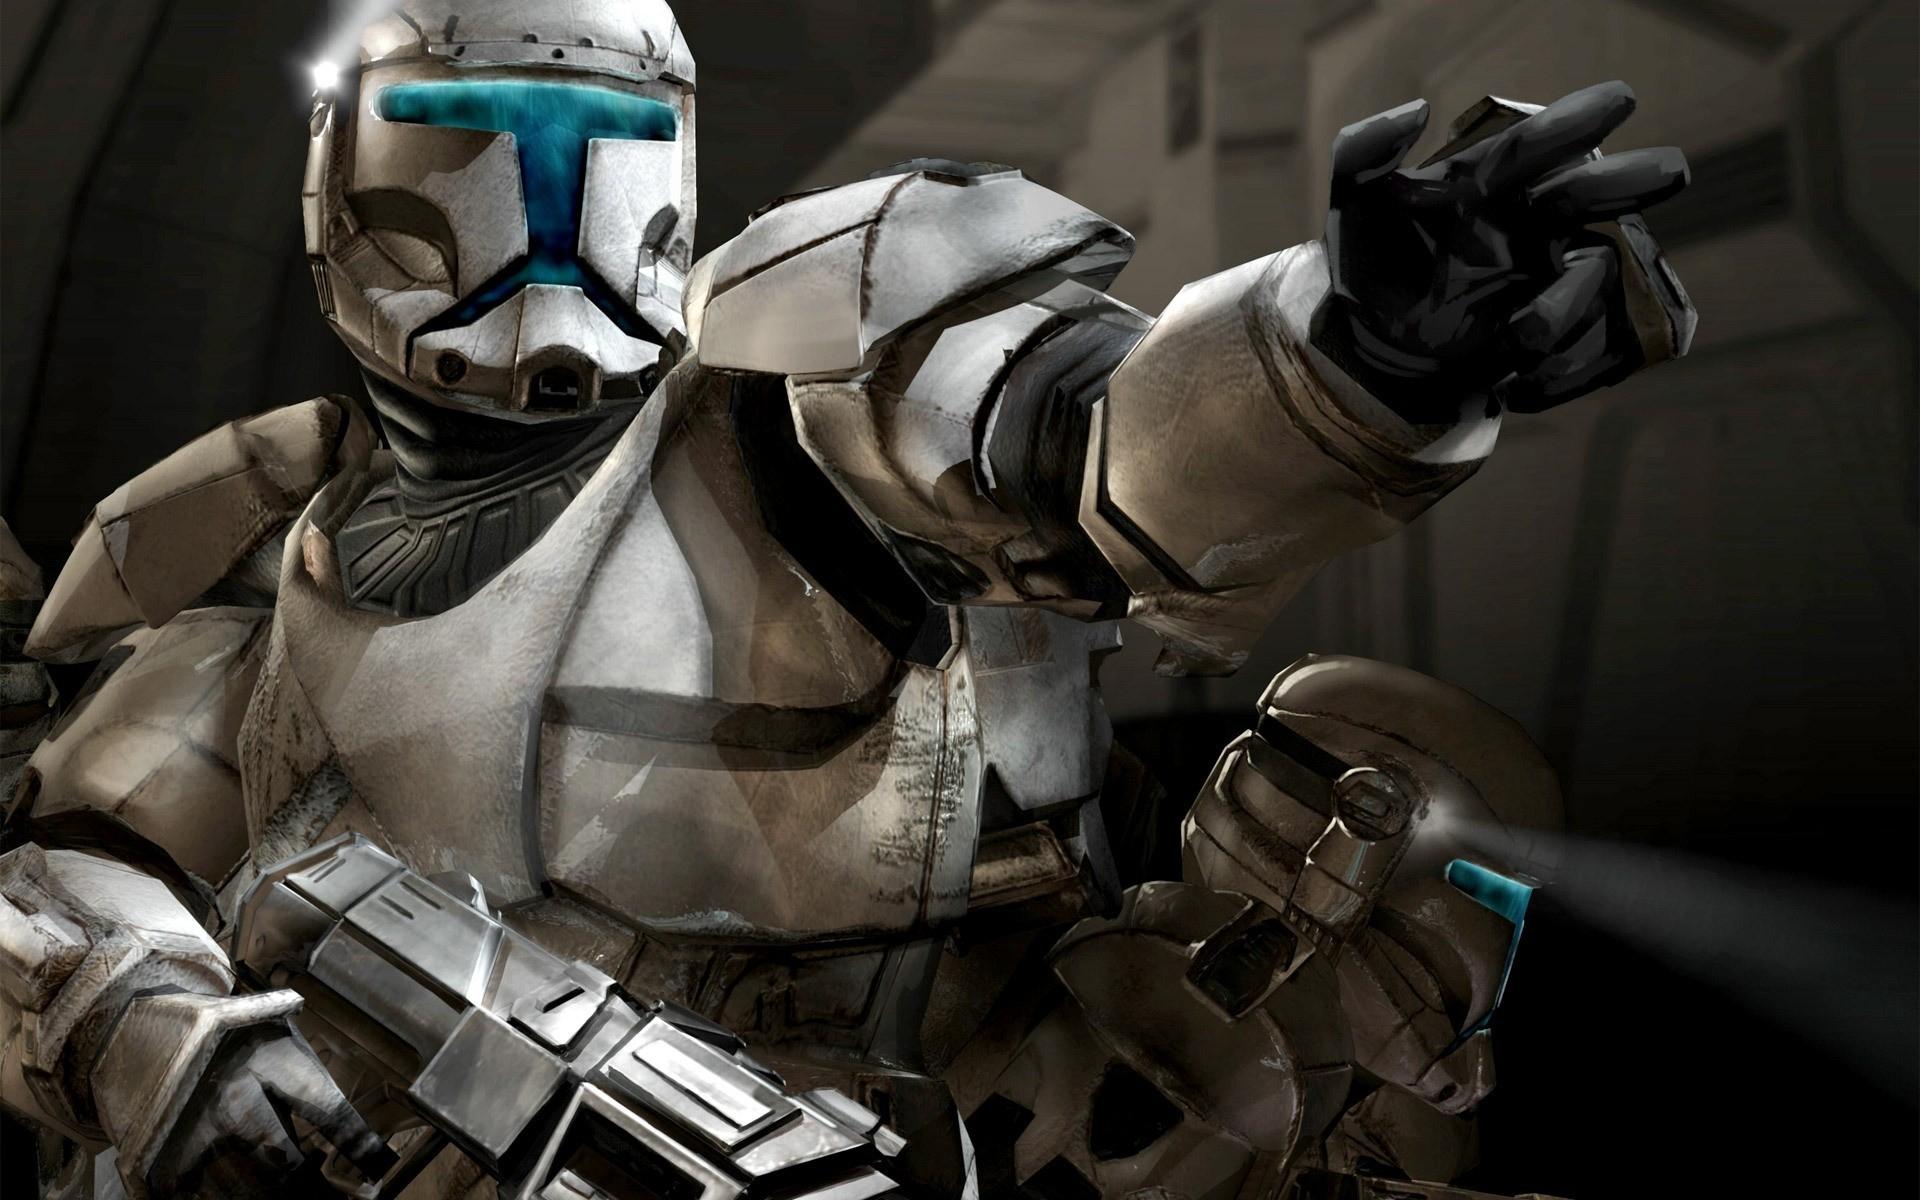 Star wars, wallpaper, republic, old, trooper, background .